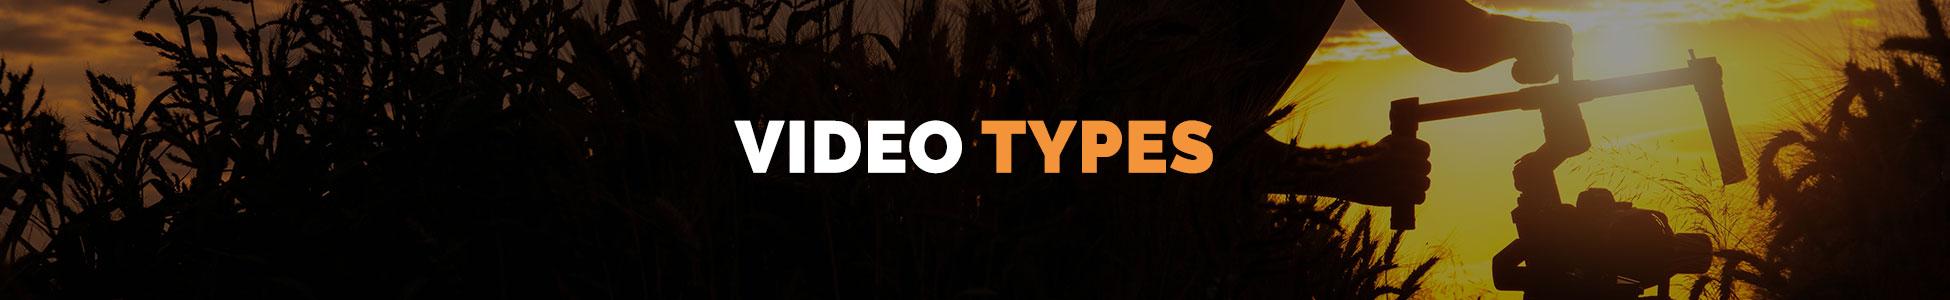 video types